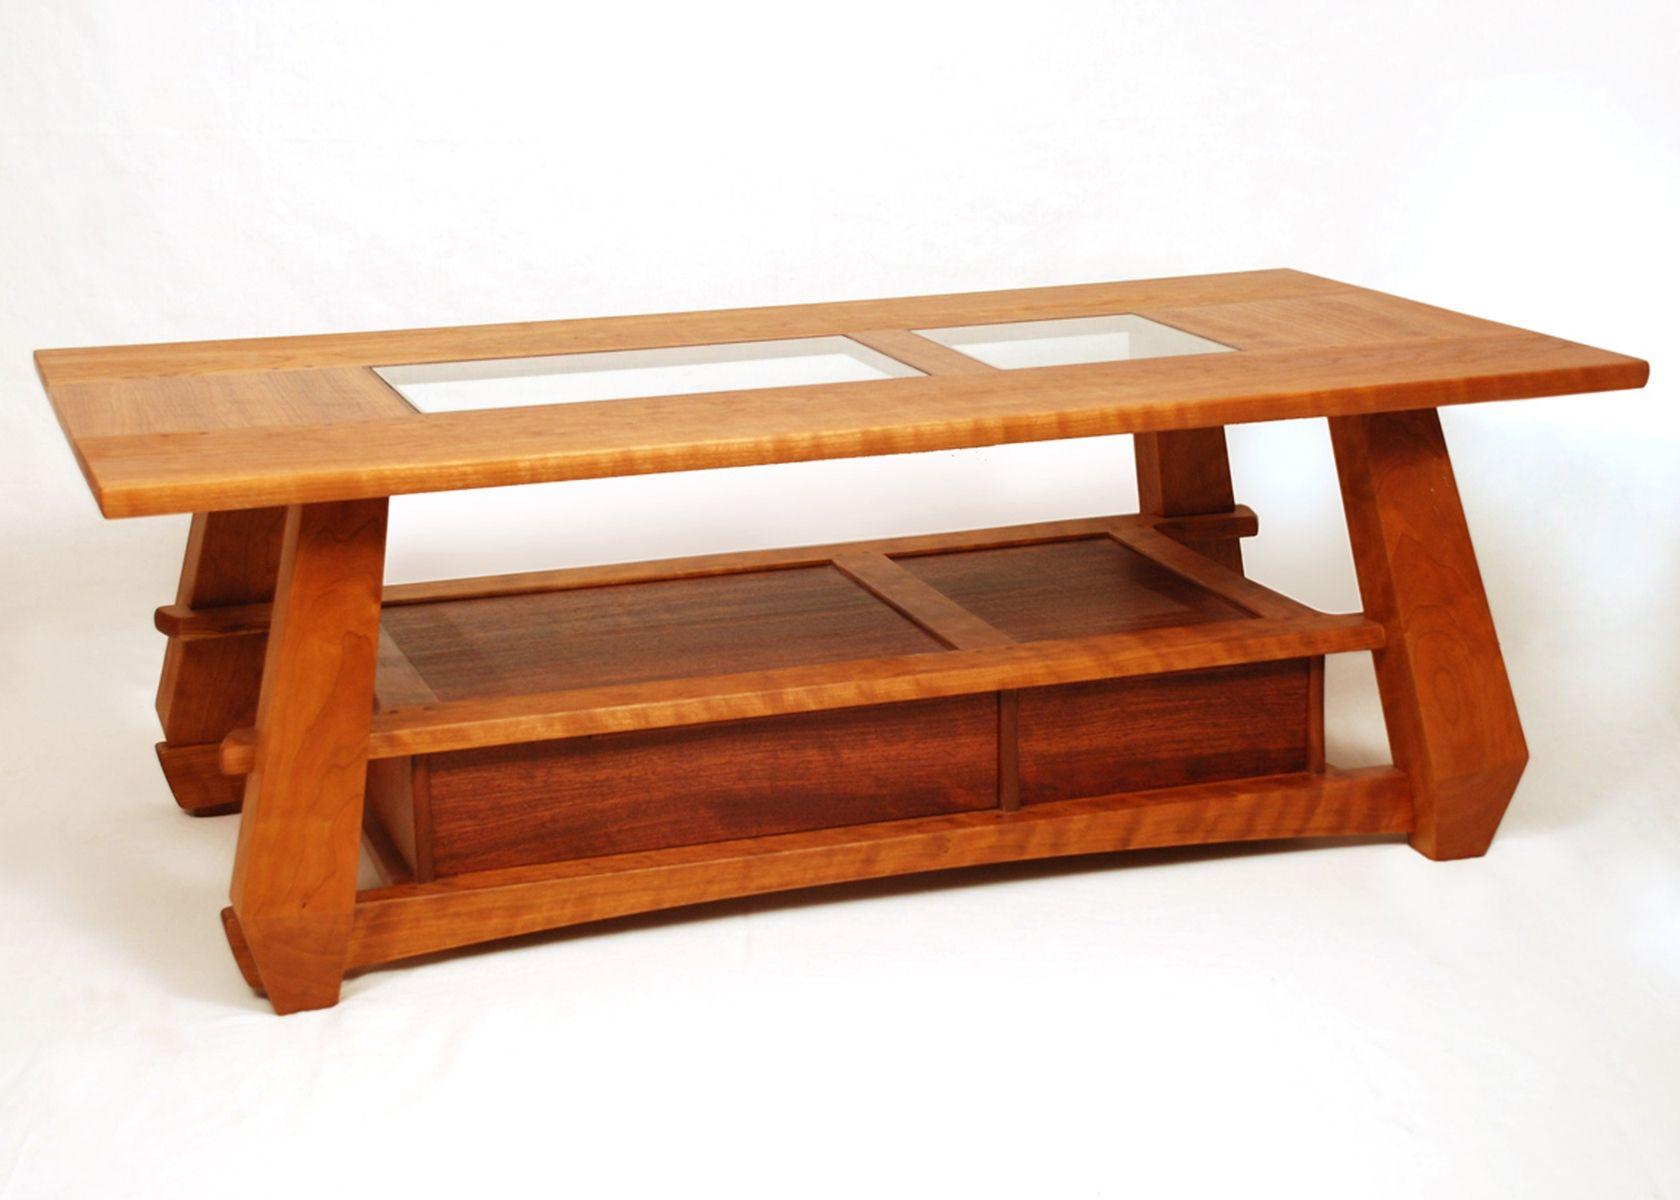 Custom Made Cherry Coffee Table Woodworking